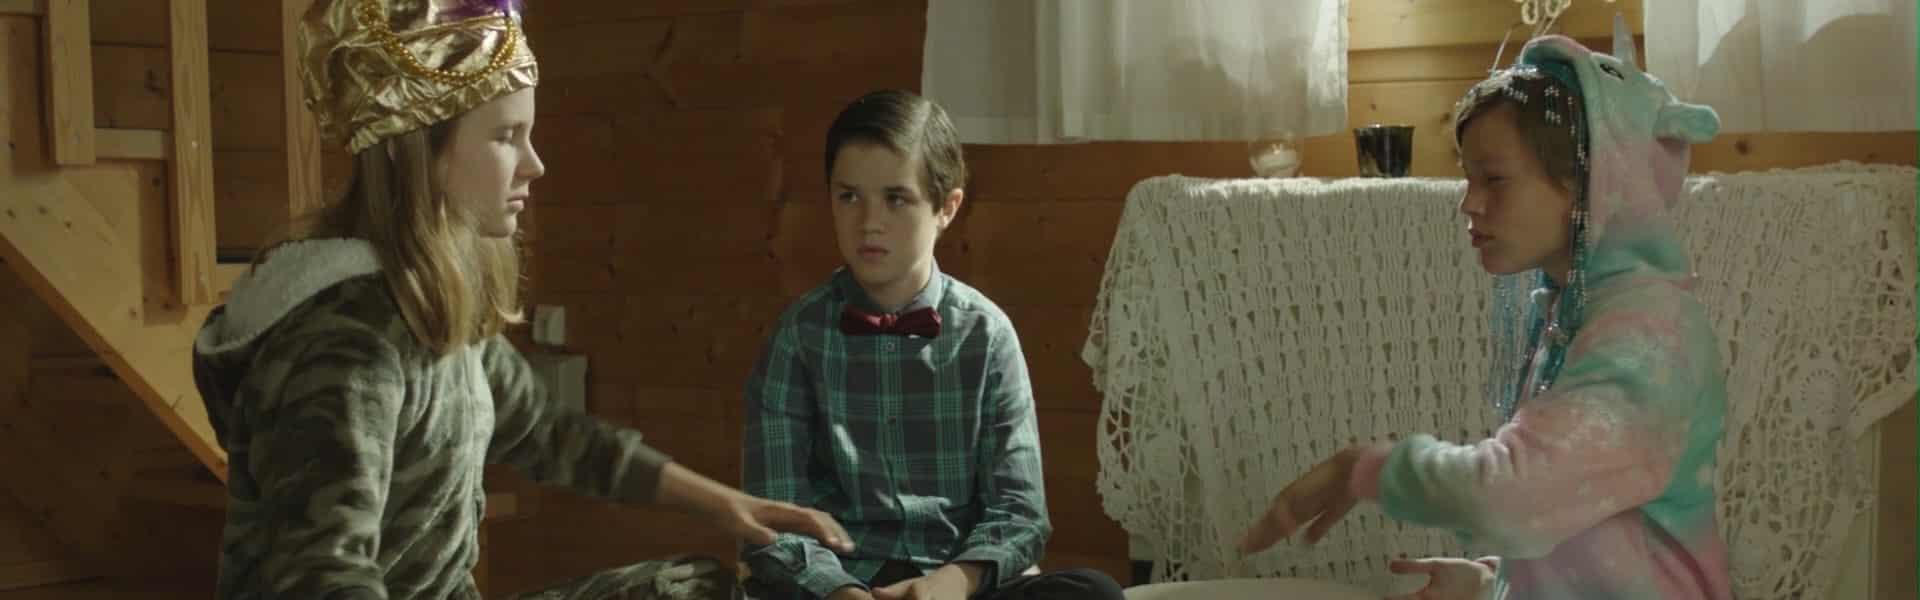 Elena (Rhea C Tober), Lolo (Zev Starret) and Toby (Sam Atlas) trying to do a tarot reading